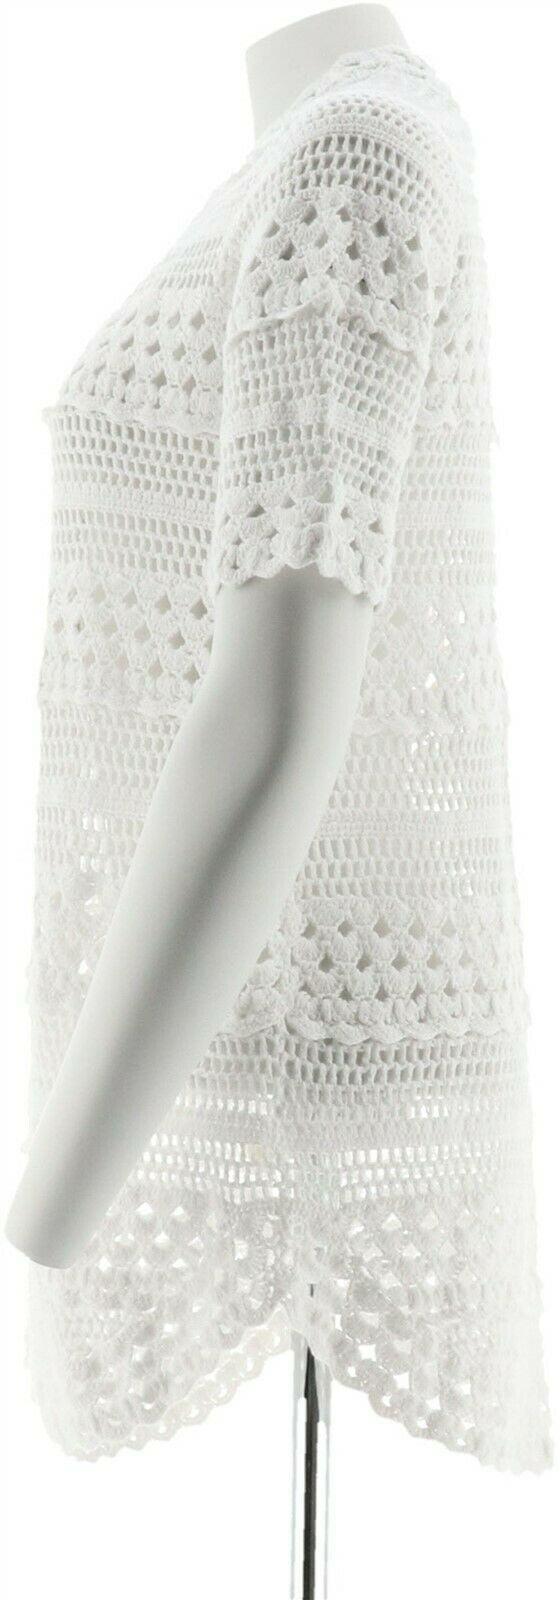 Isaac Mizrahi Hand Crochet Open Front Cardigan Bright White 1X NEW A306443